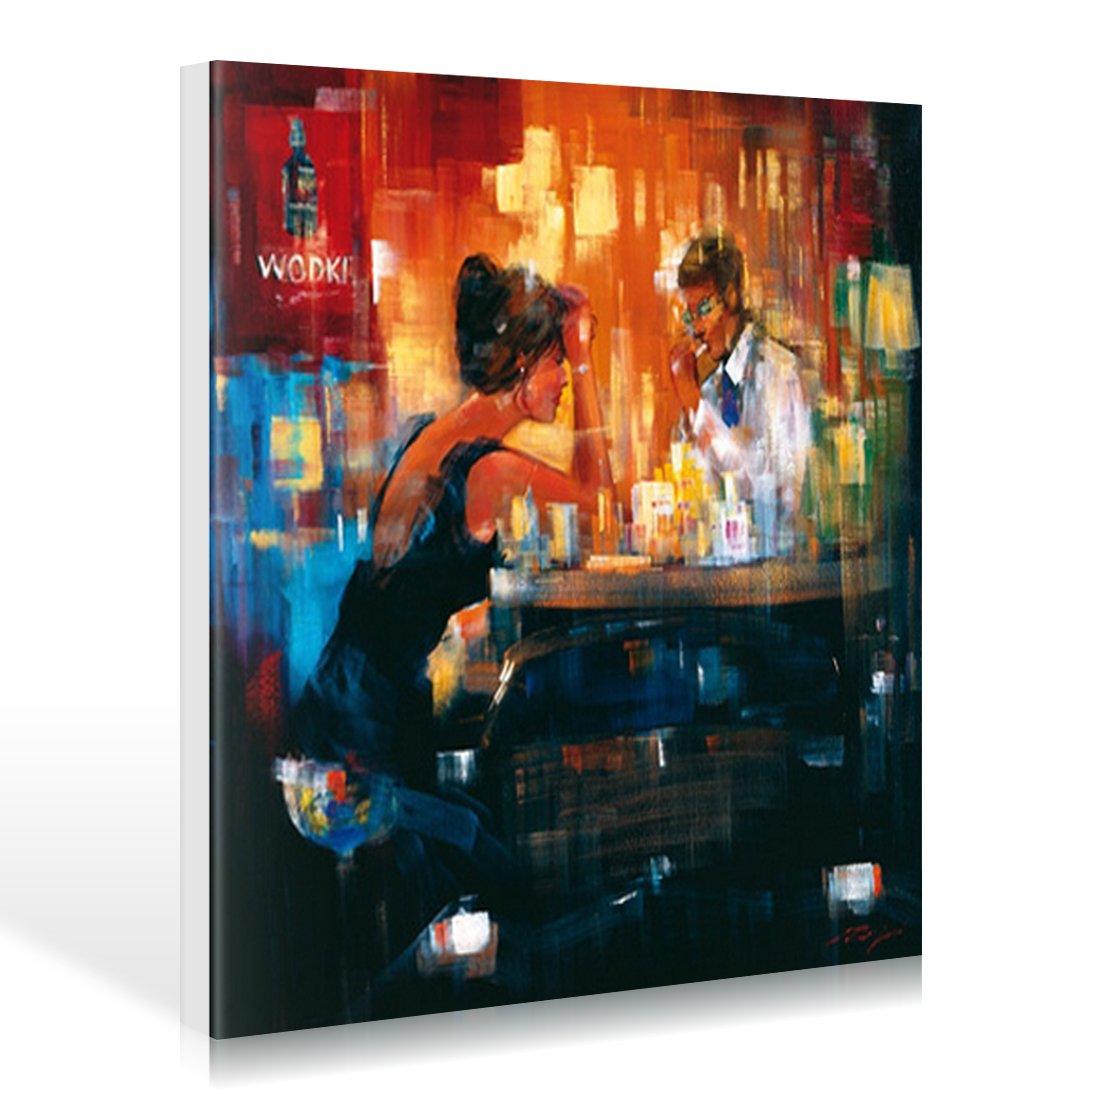 Art-Galerie Leinwandbild Madjid - Bar Scene I - 80 x 80cm - Premiumqualität - Modern, Barszene, Gesellschaft, Mann, Frau, Paar, Date, Getränke, Wodka, Dri. - Made in Germany SHOPde